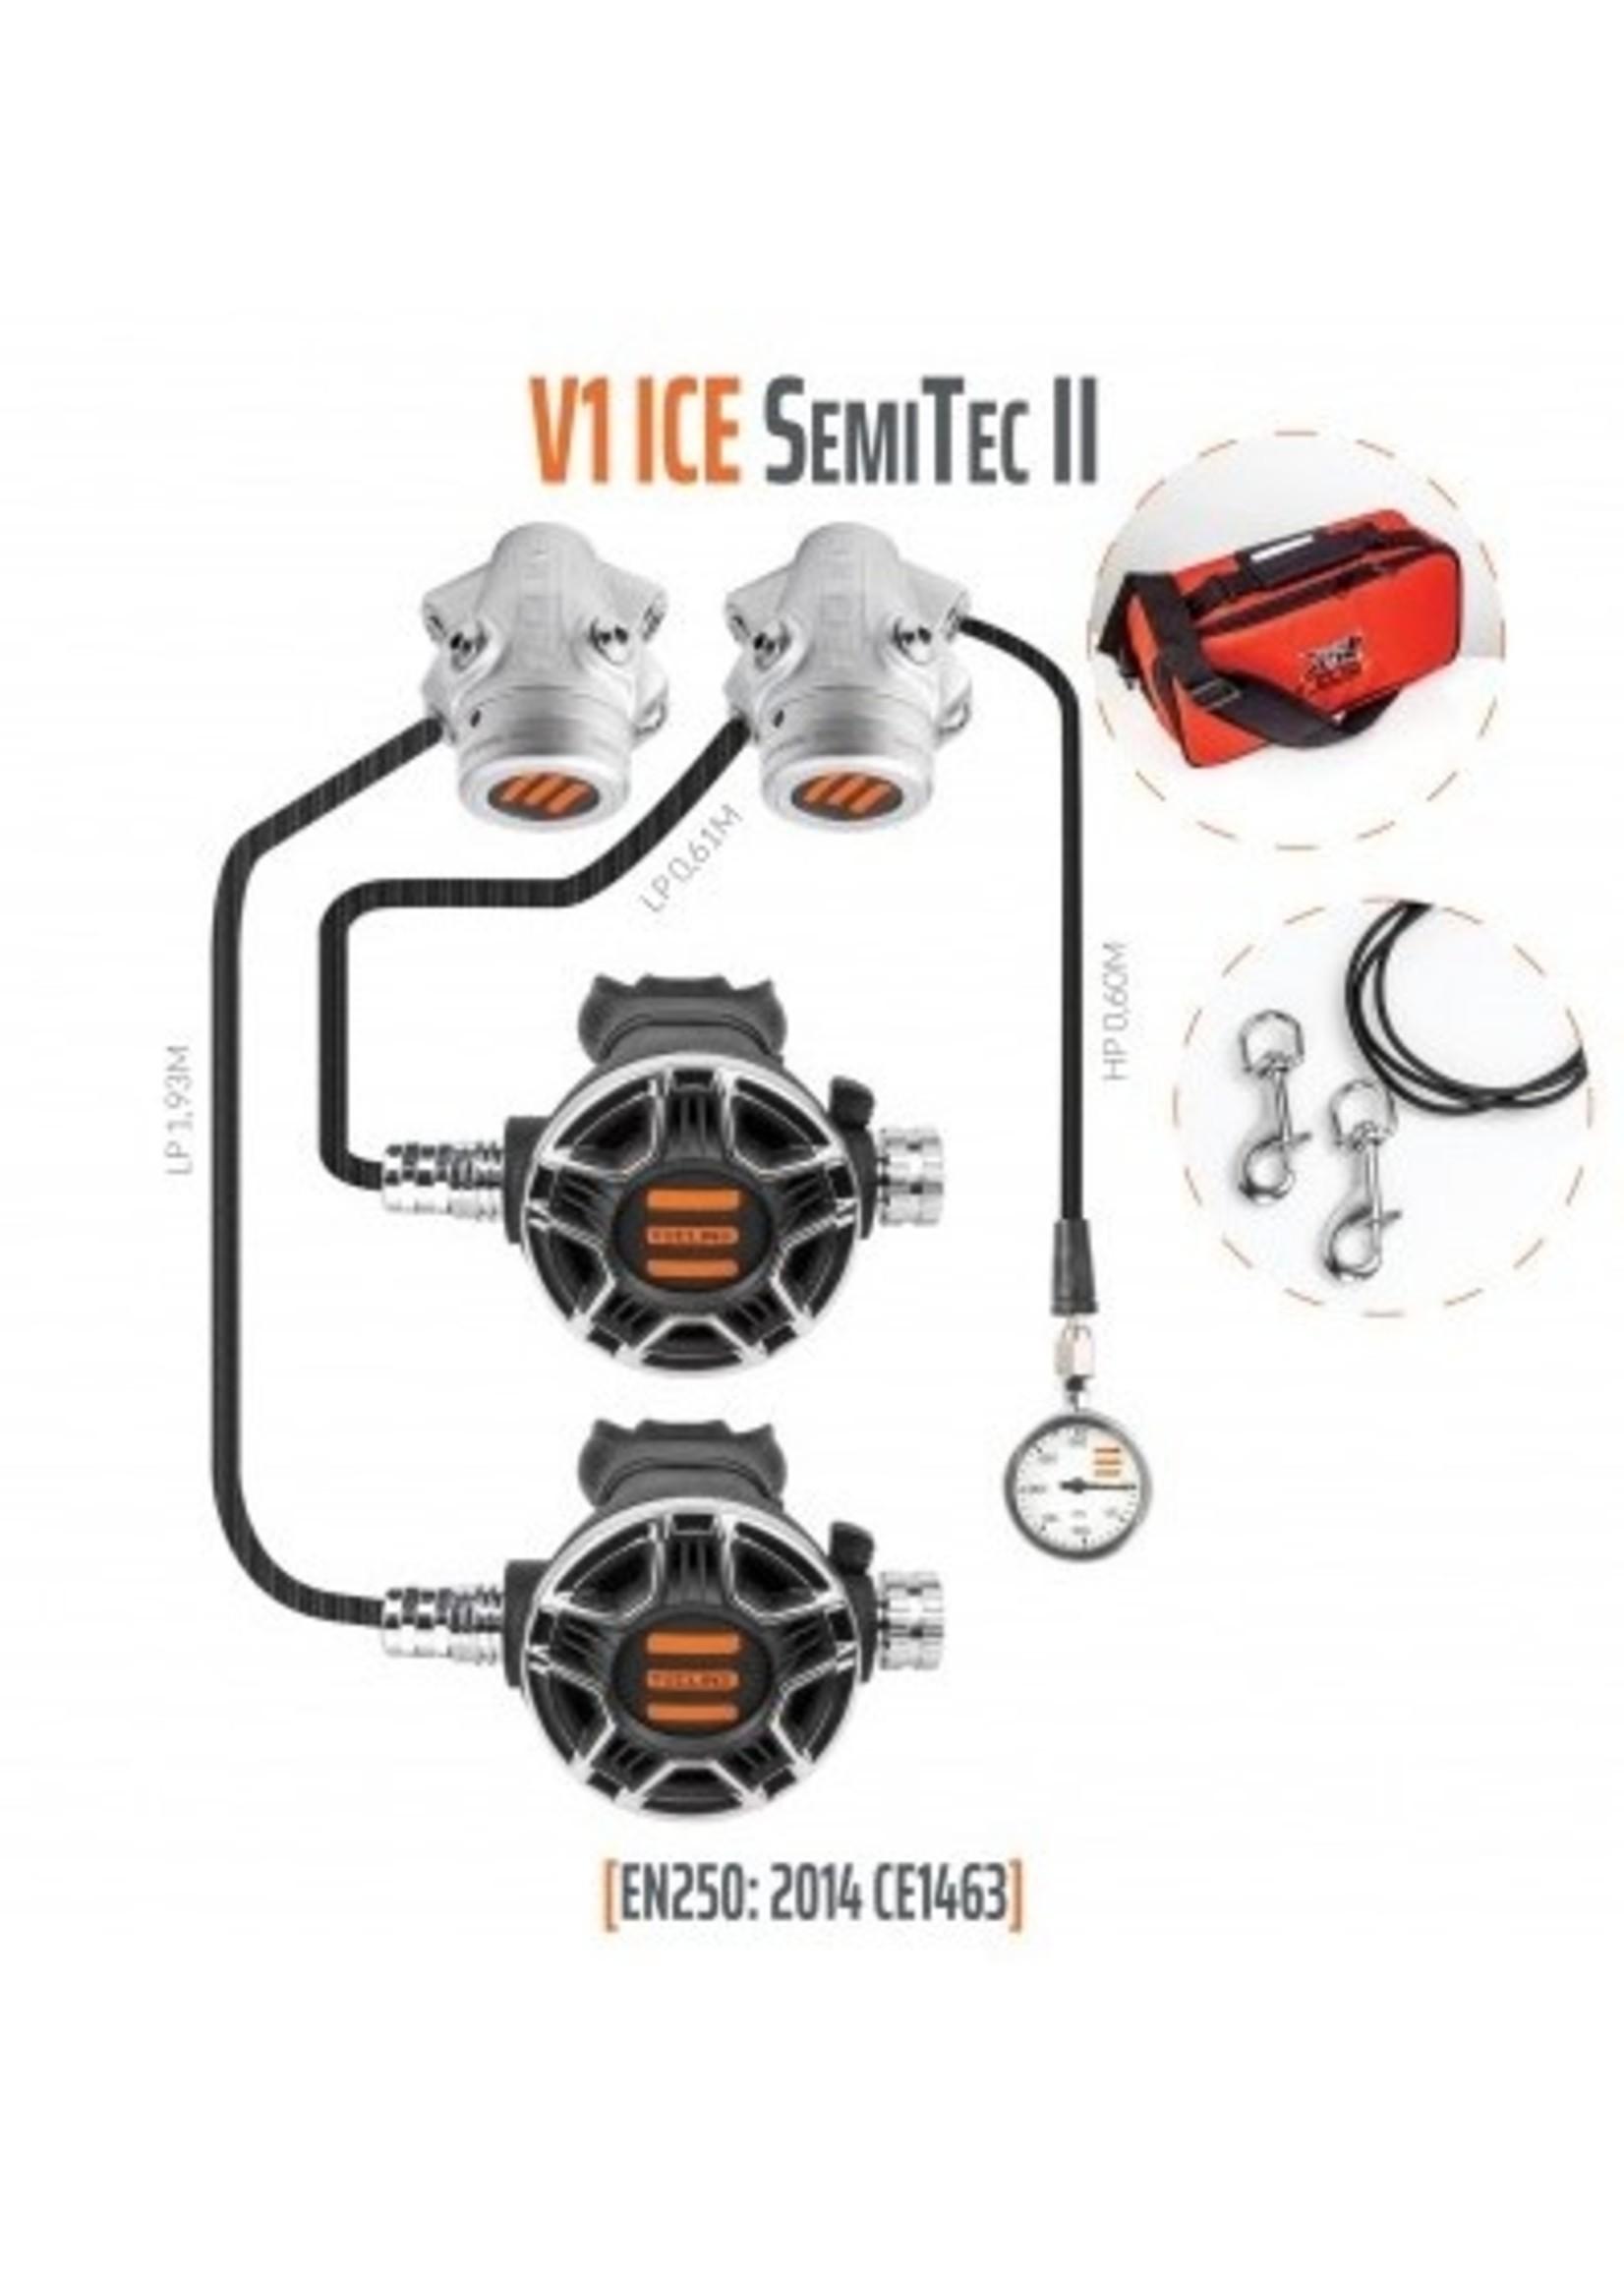 TecLine Tecline V1 Ice TEC2 SemiTec II set met Mano